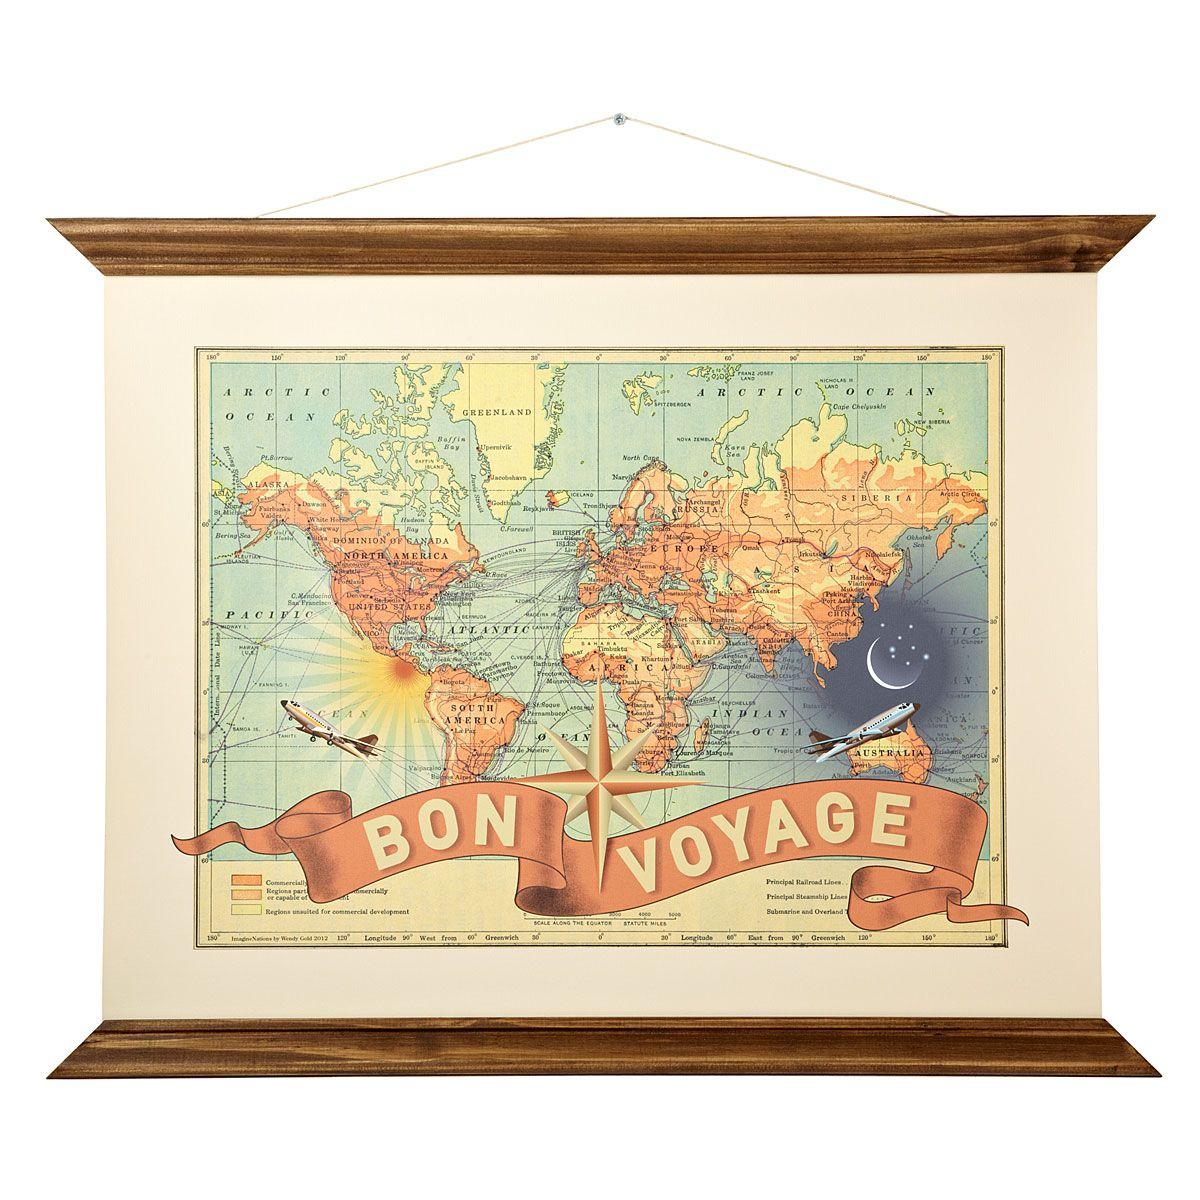 Bon voyage bon voyage vintage maps and voyage bon voyage wendy gold vintage map art print uncommongoods gumiabroncs Gallery